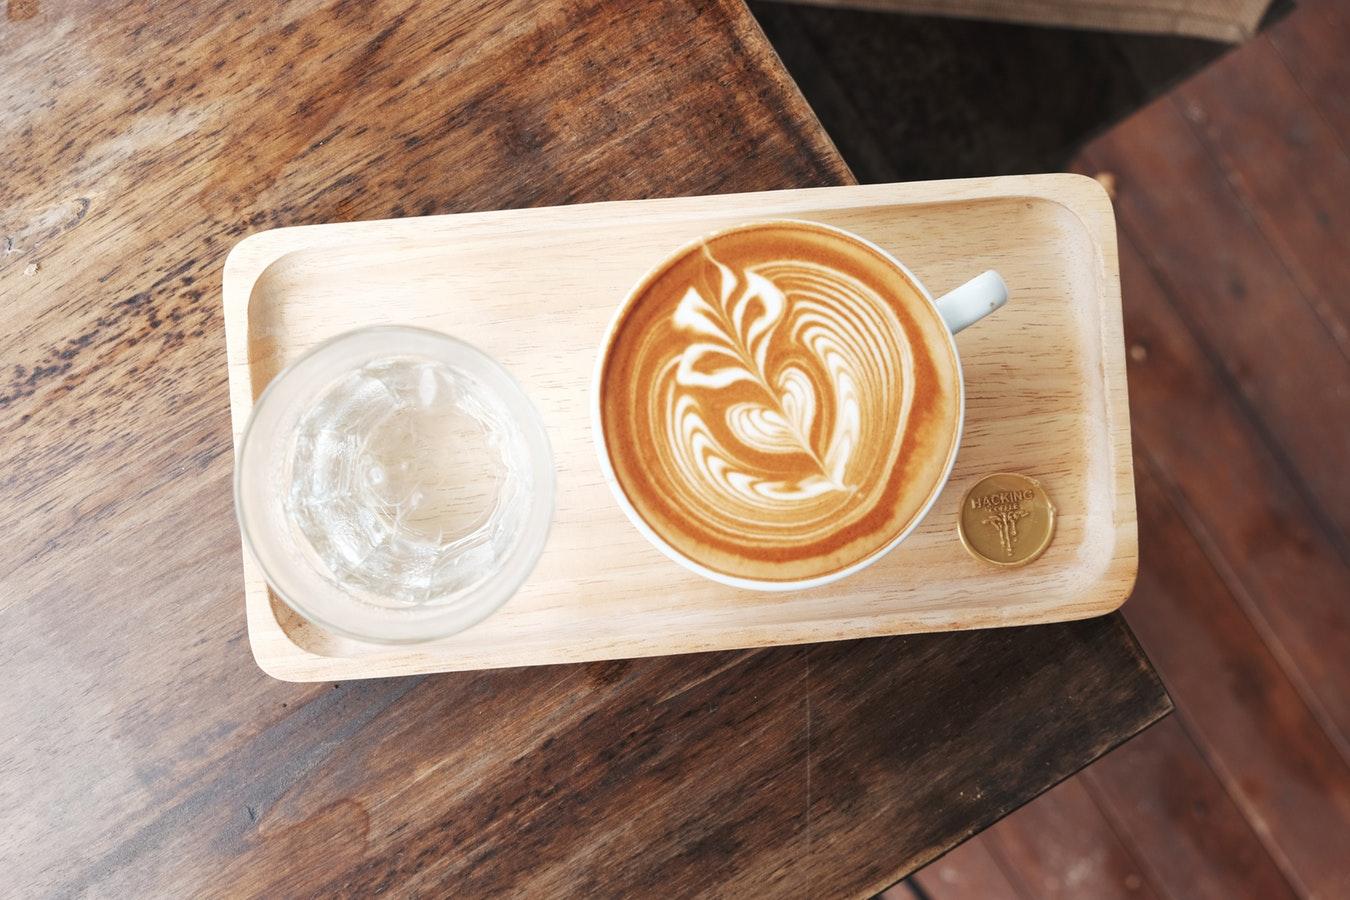 Socialtree coffee